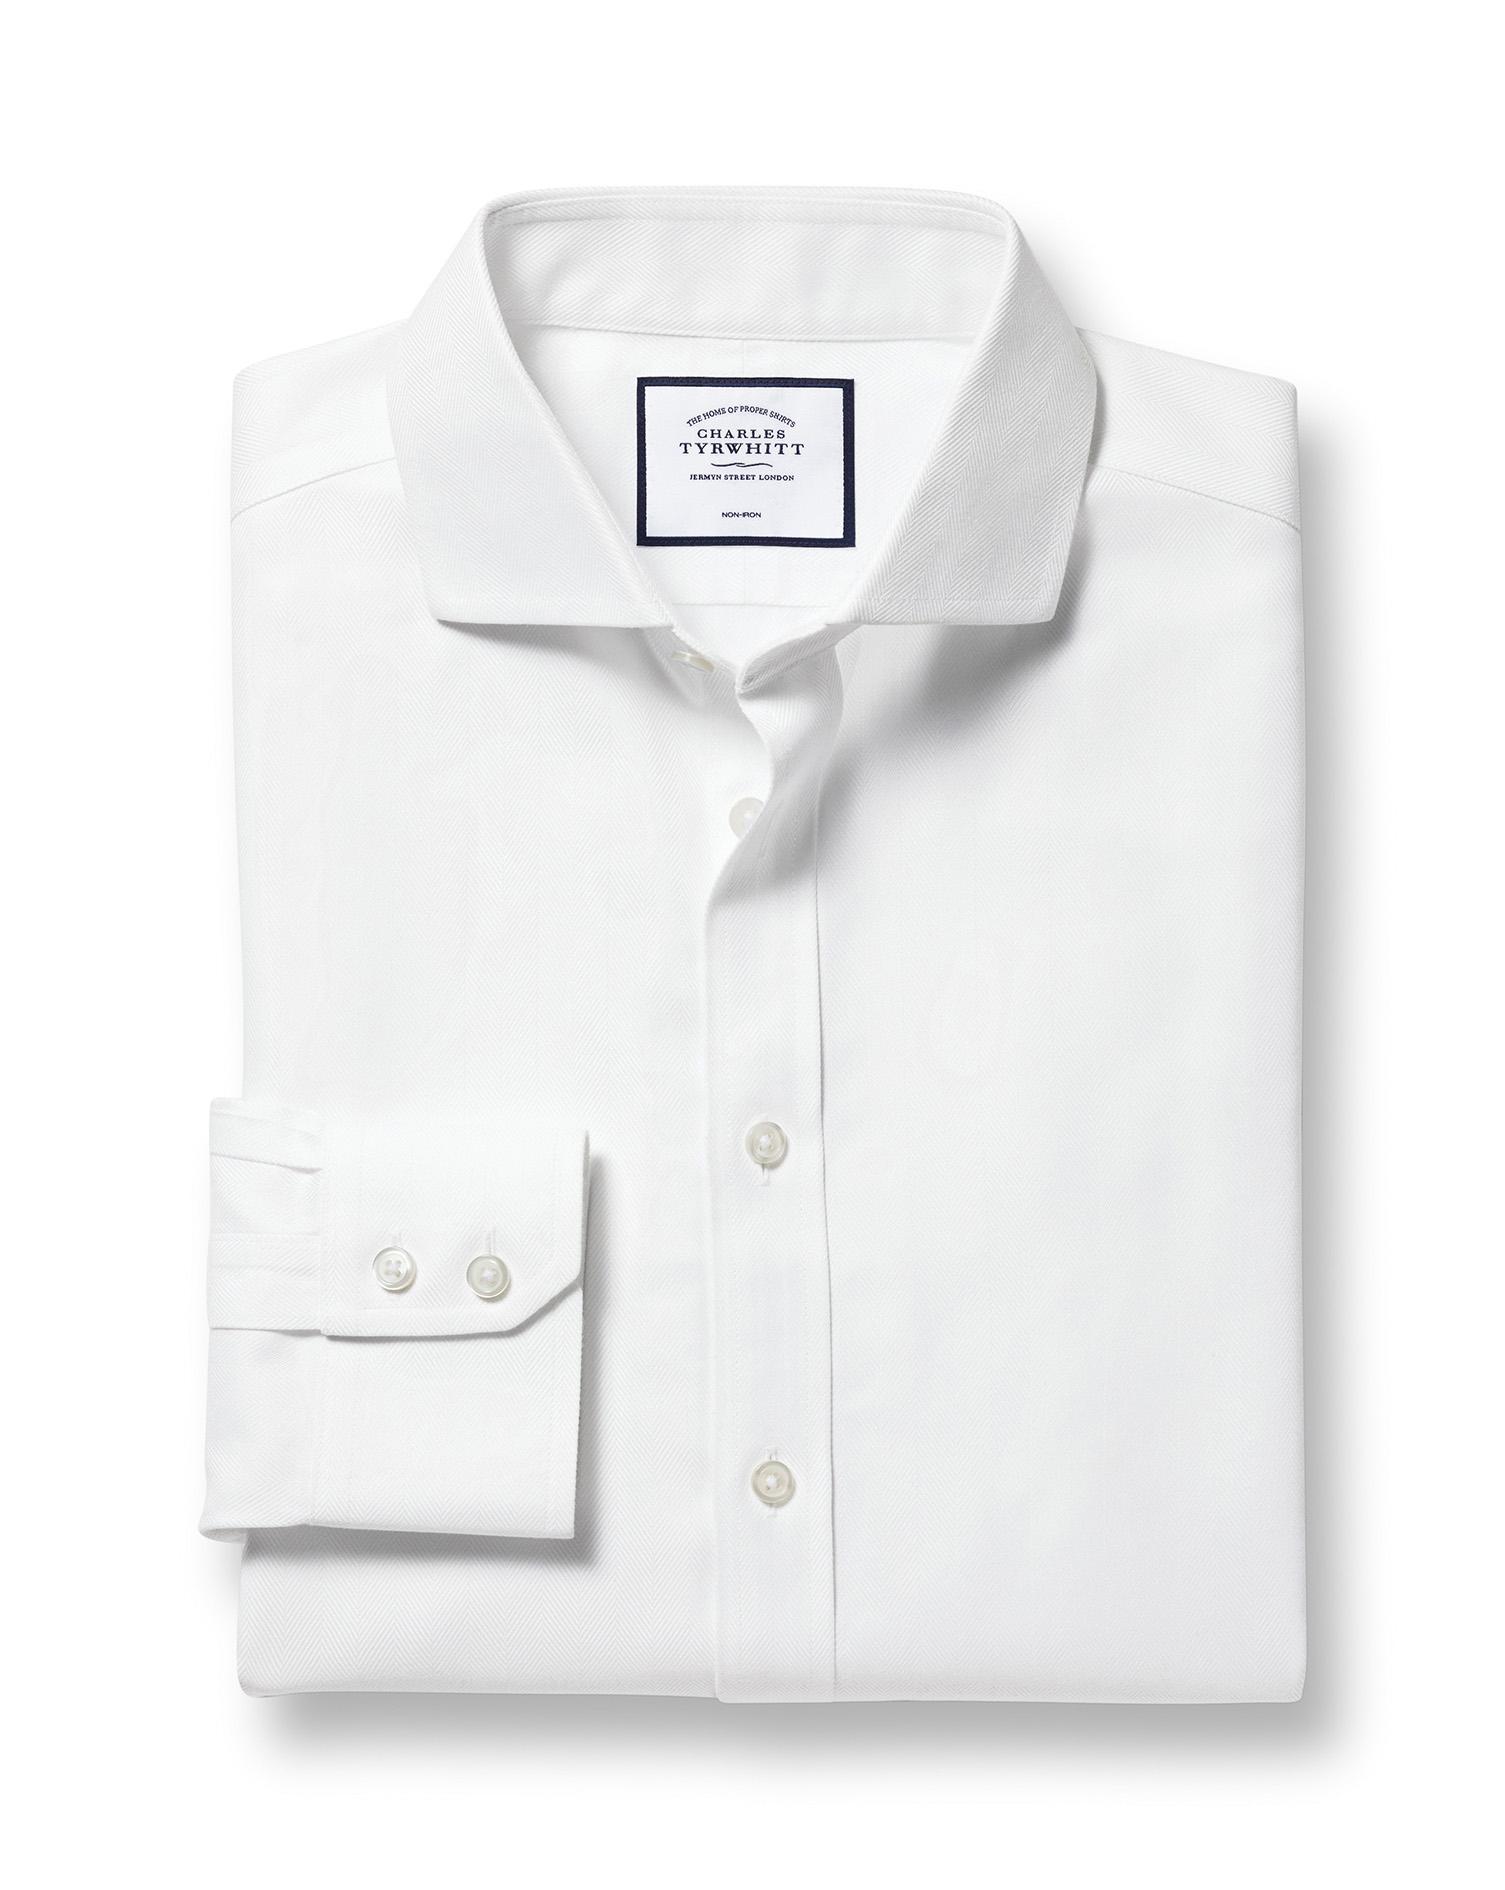 Cotton Extra Slim Fit Non-Iron White Herringbone Shirt